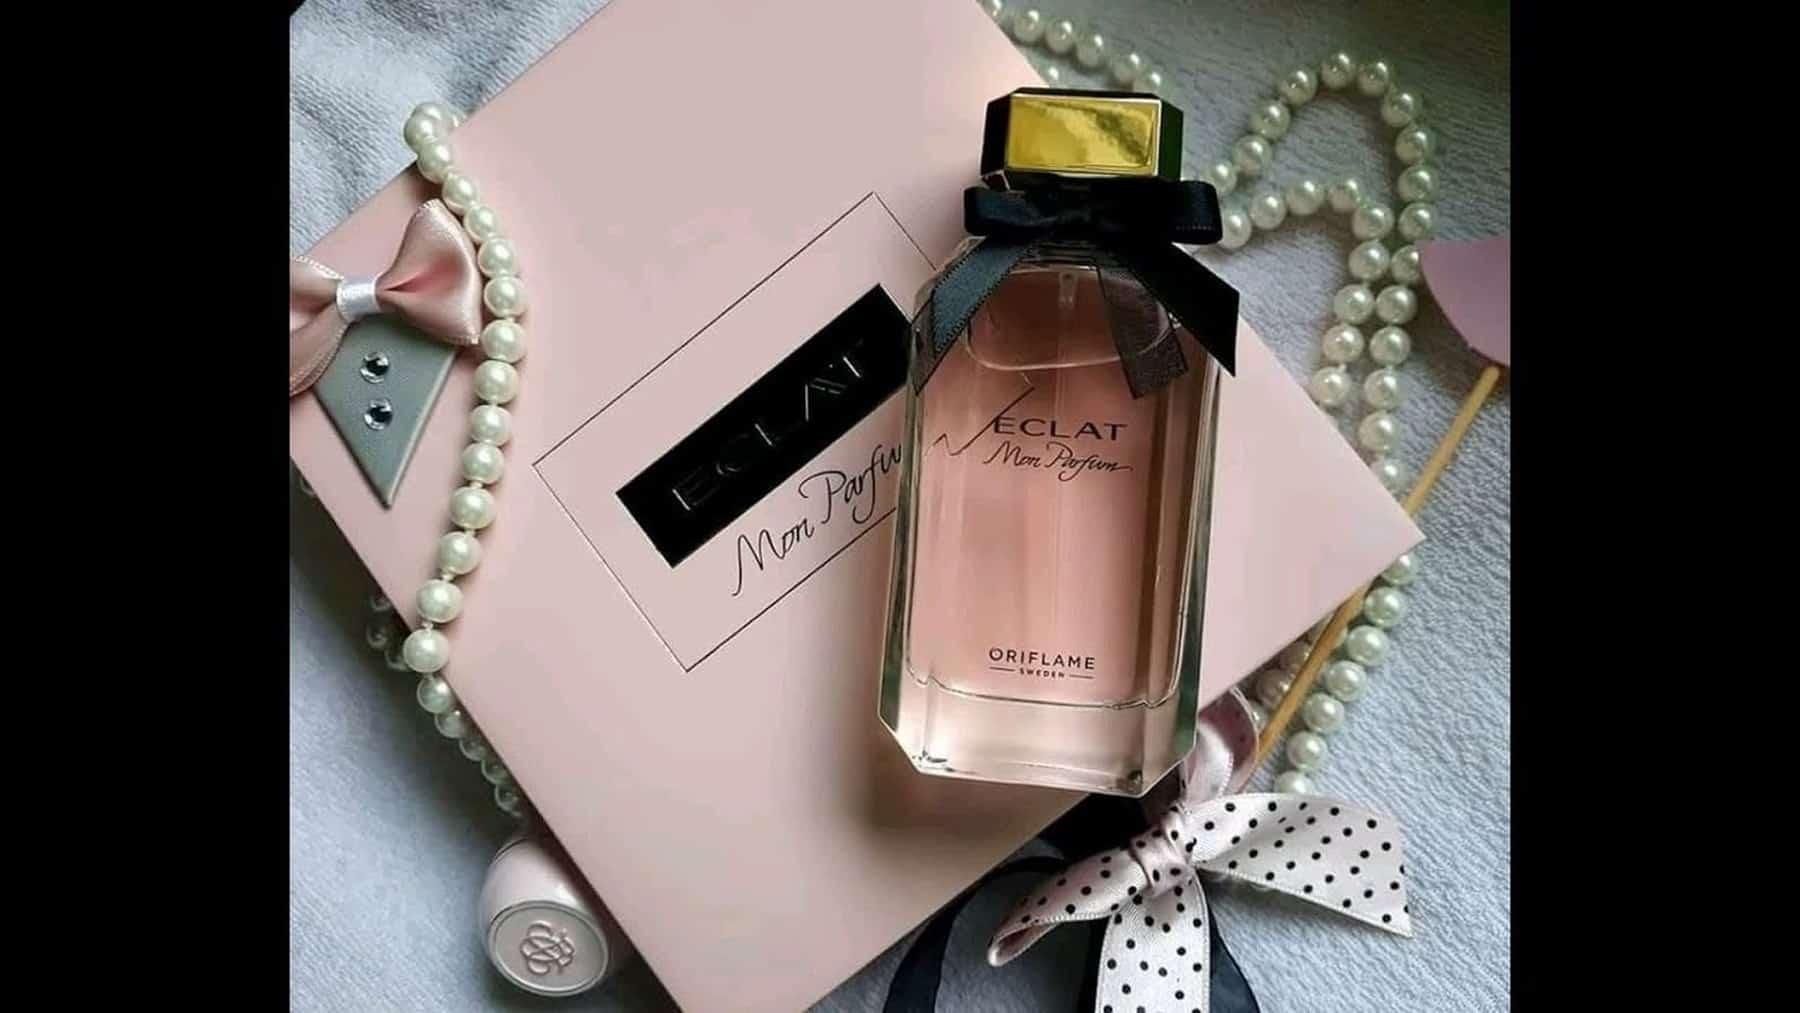 Eclat Mon Parfum parfem slika O 93322557 - ادوپرفیوم زنانه اوریفلیم مدل ECLAT mon Parfum حجم 50 میلی لیتر